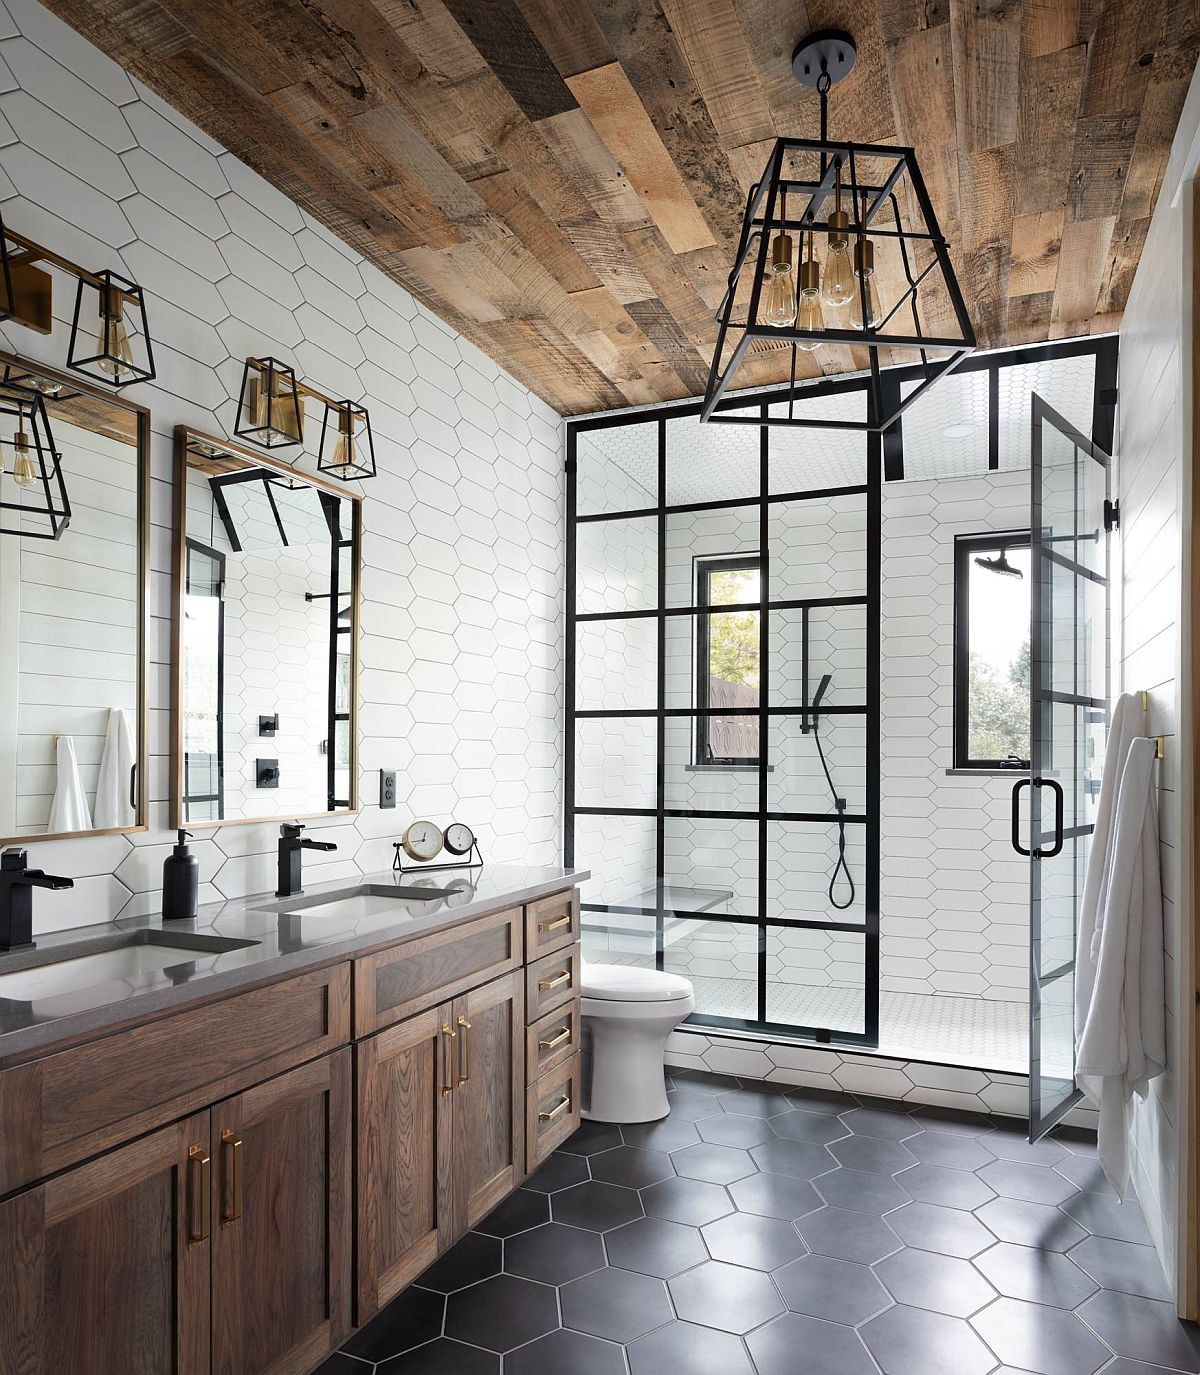 Gorgeous industrial farmhouse style bathroom with hexagonal gray floor tiles. wooden ceiling and lovely dark-framed shower area